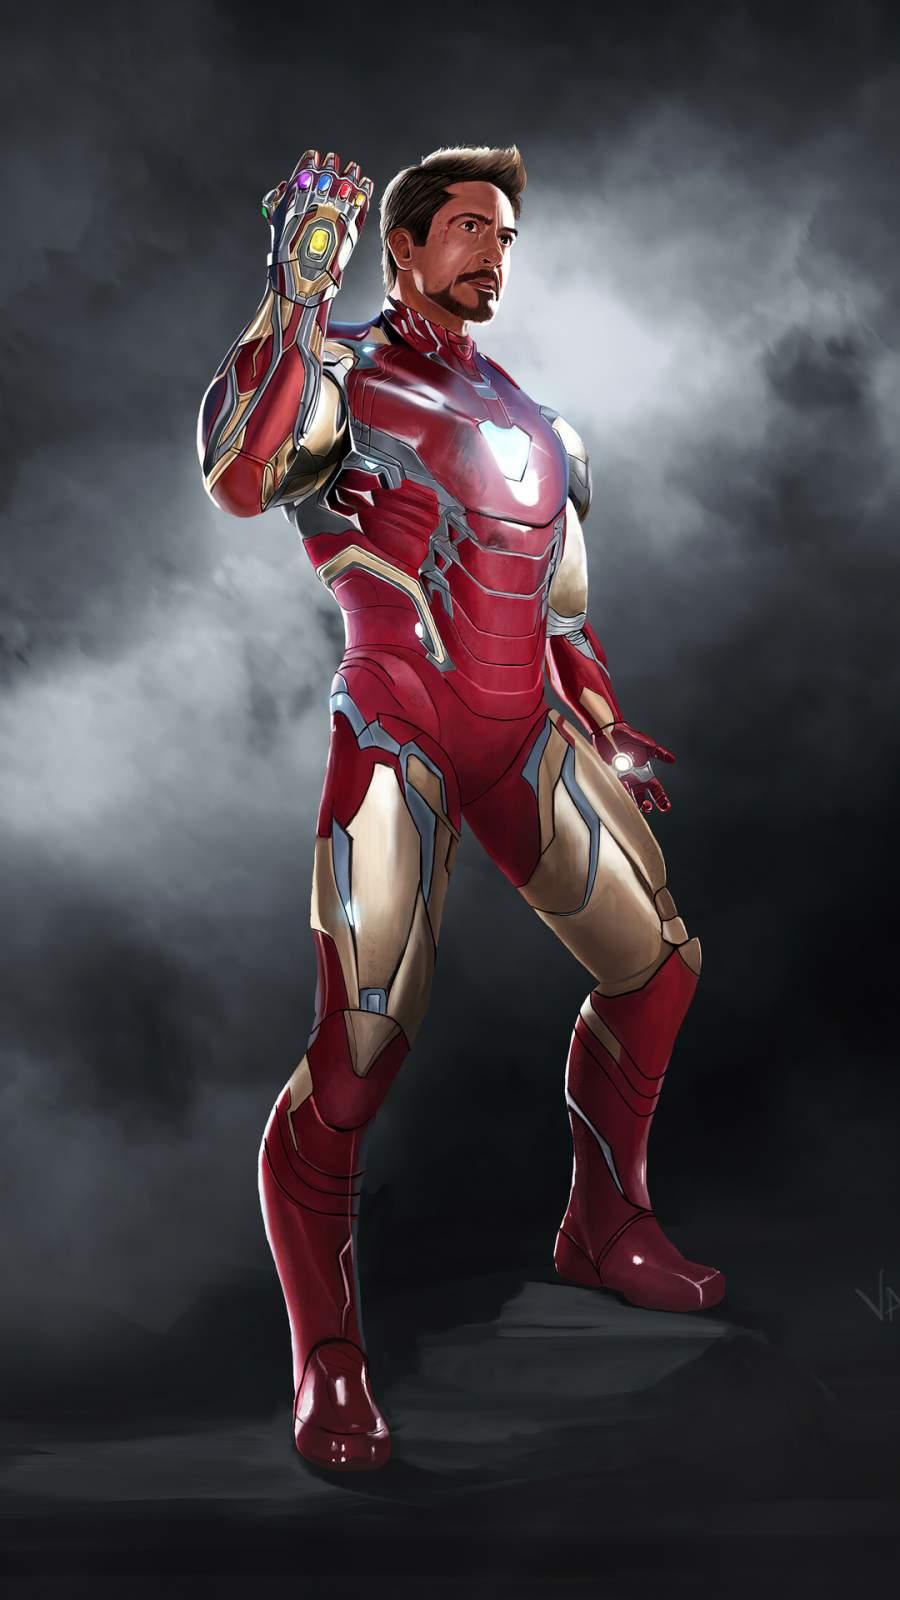 Iron Man 2020 iPhone Wallpaper